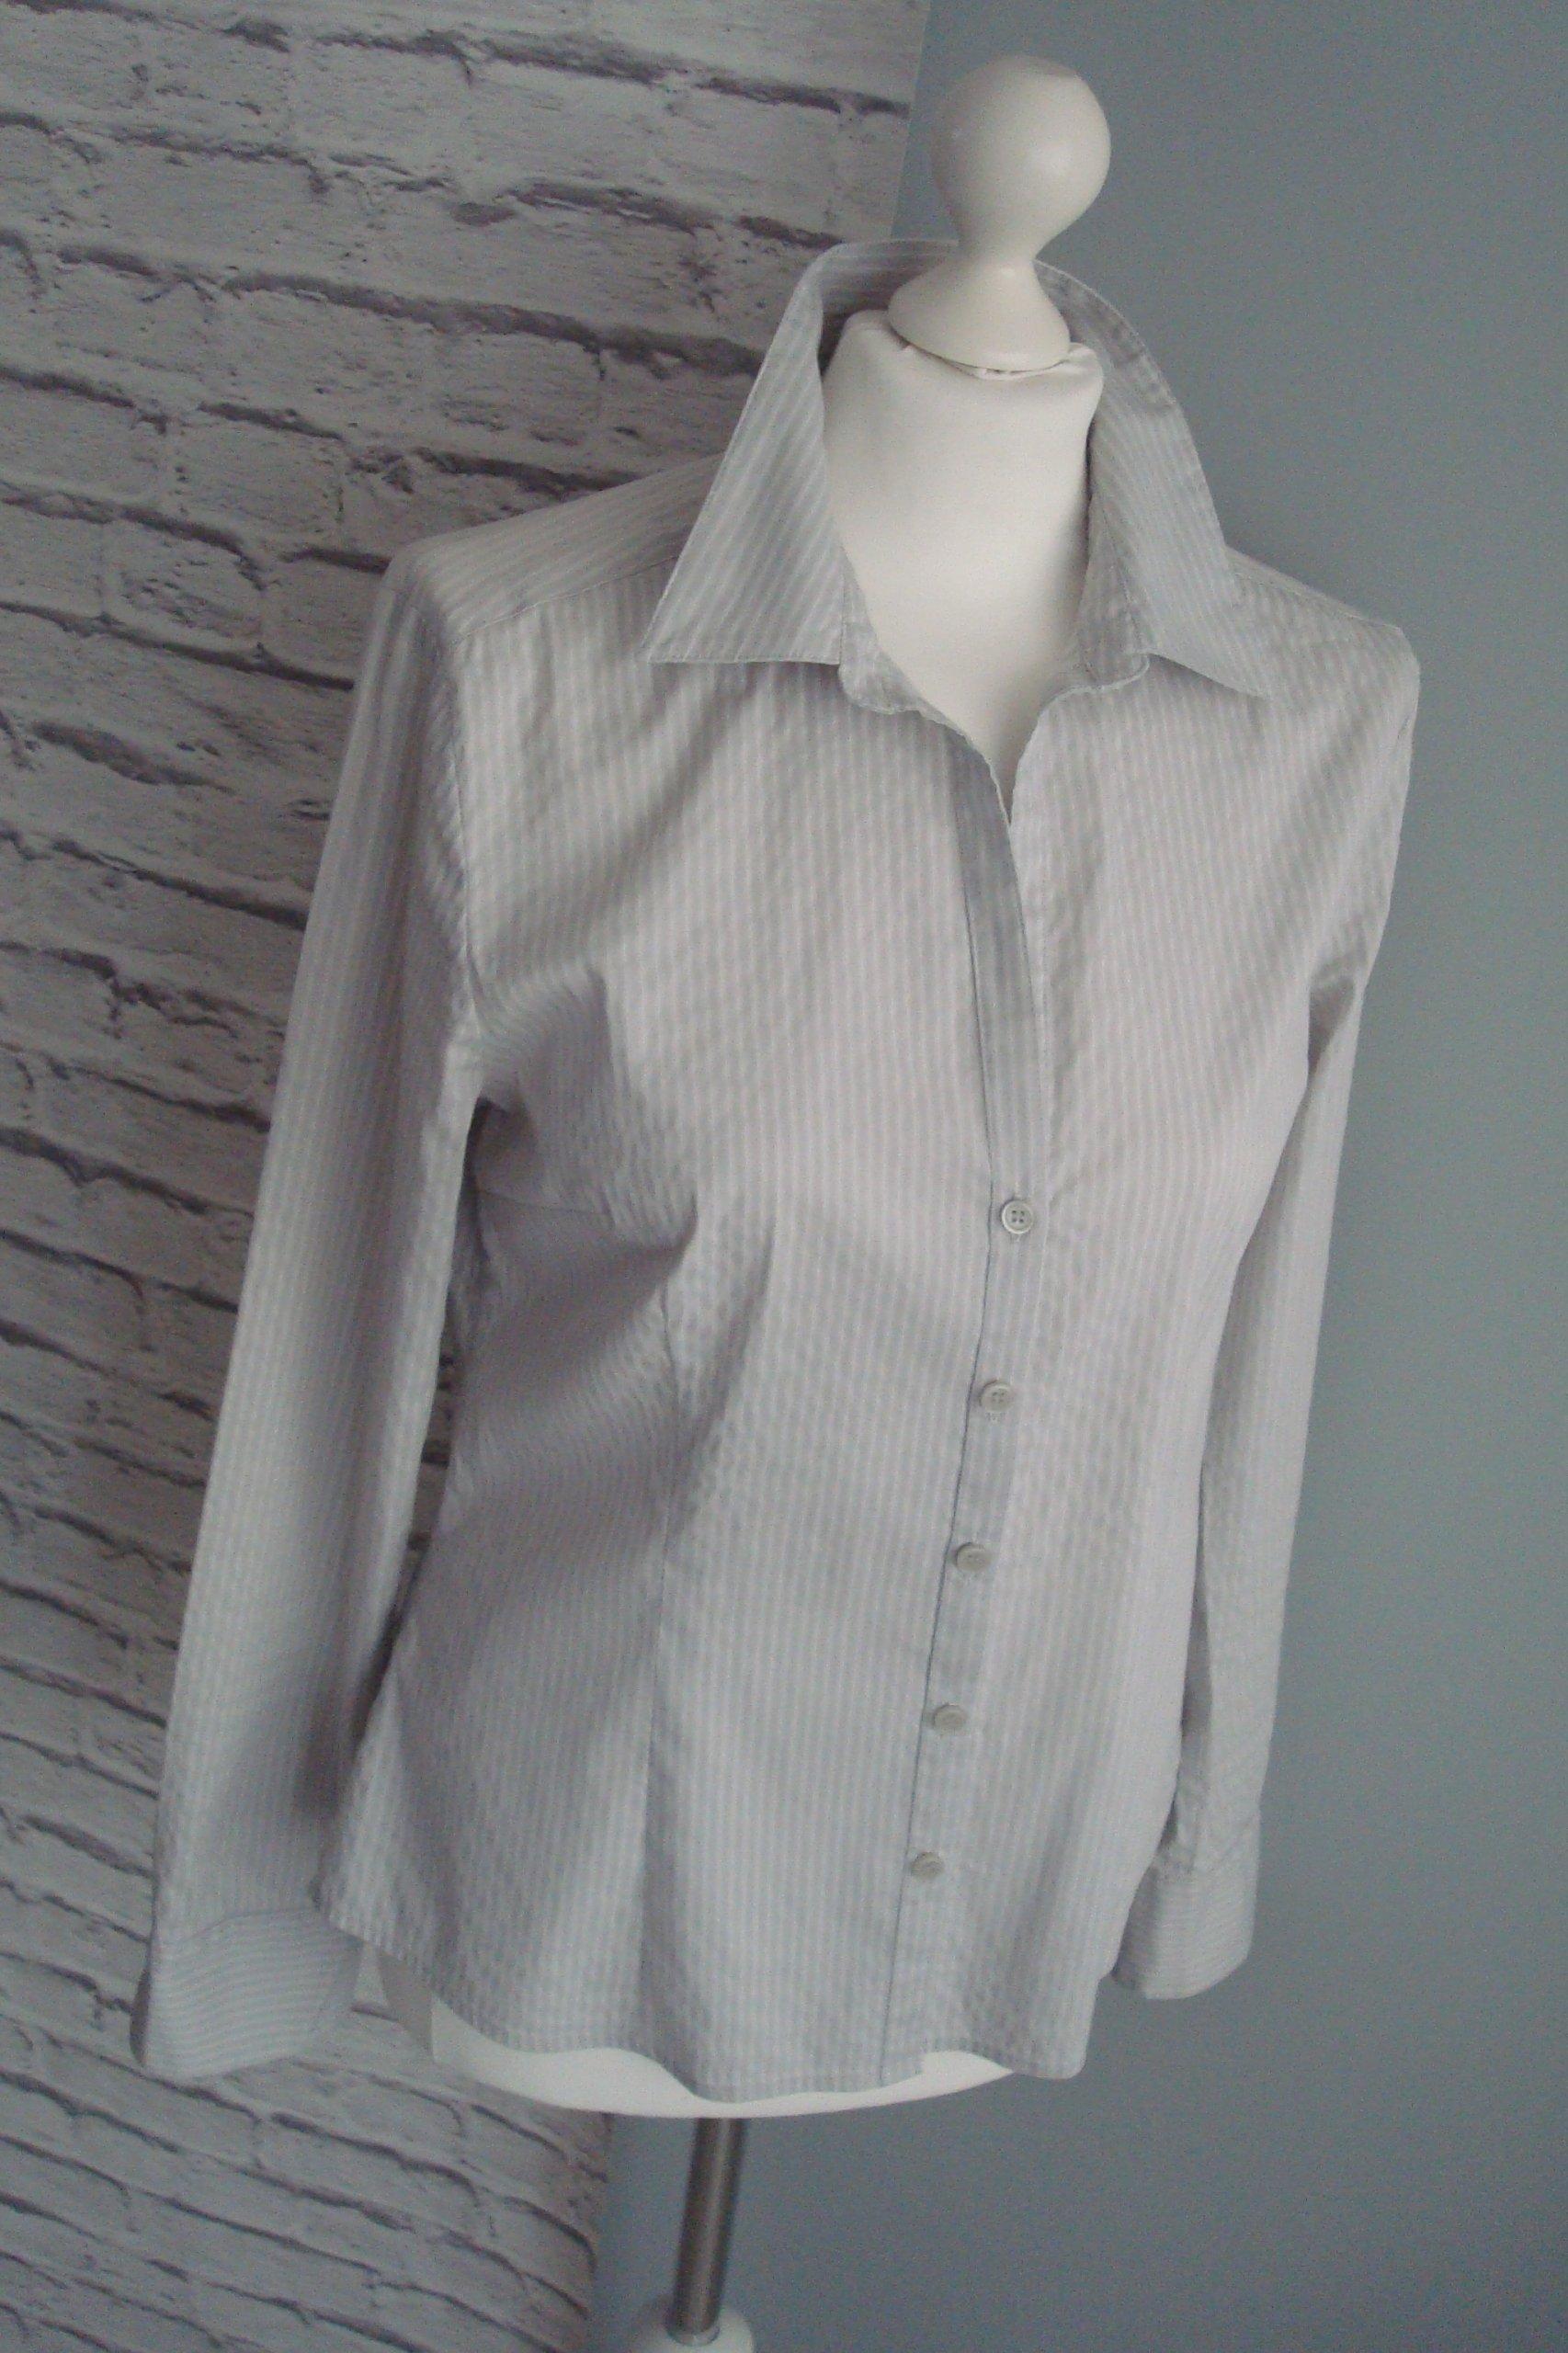 H&M bluzka casual koszula szara biała paski 40